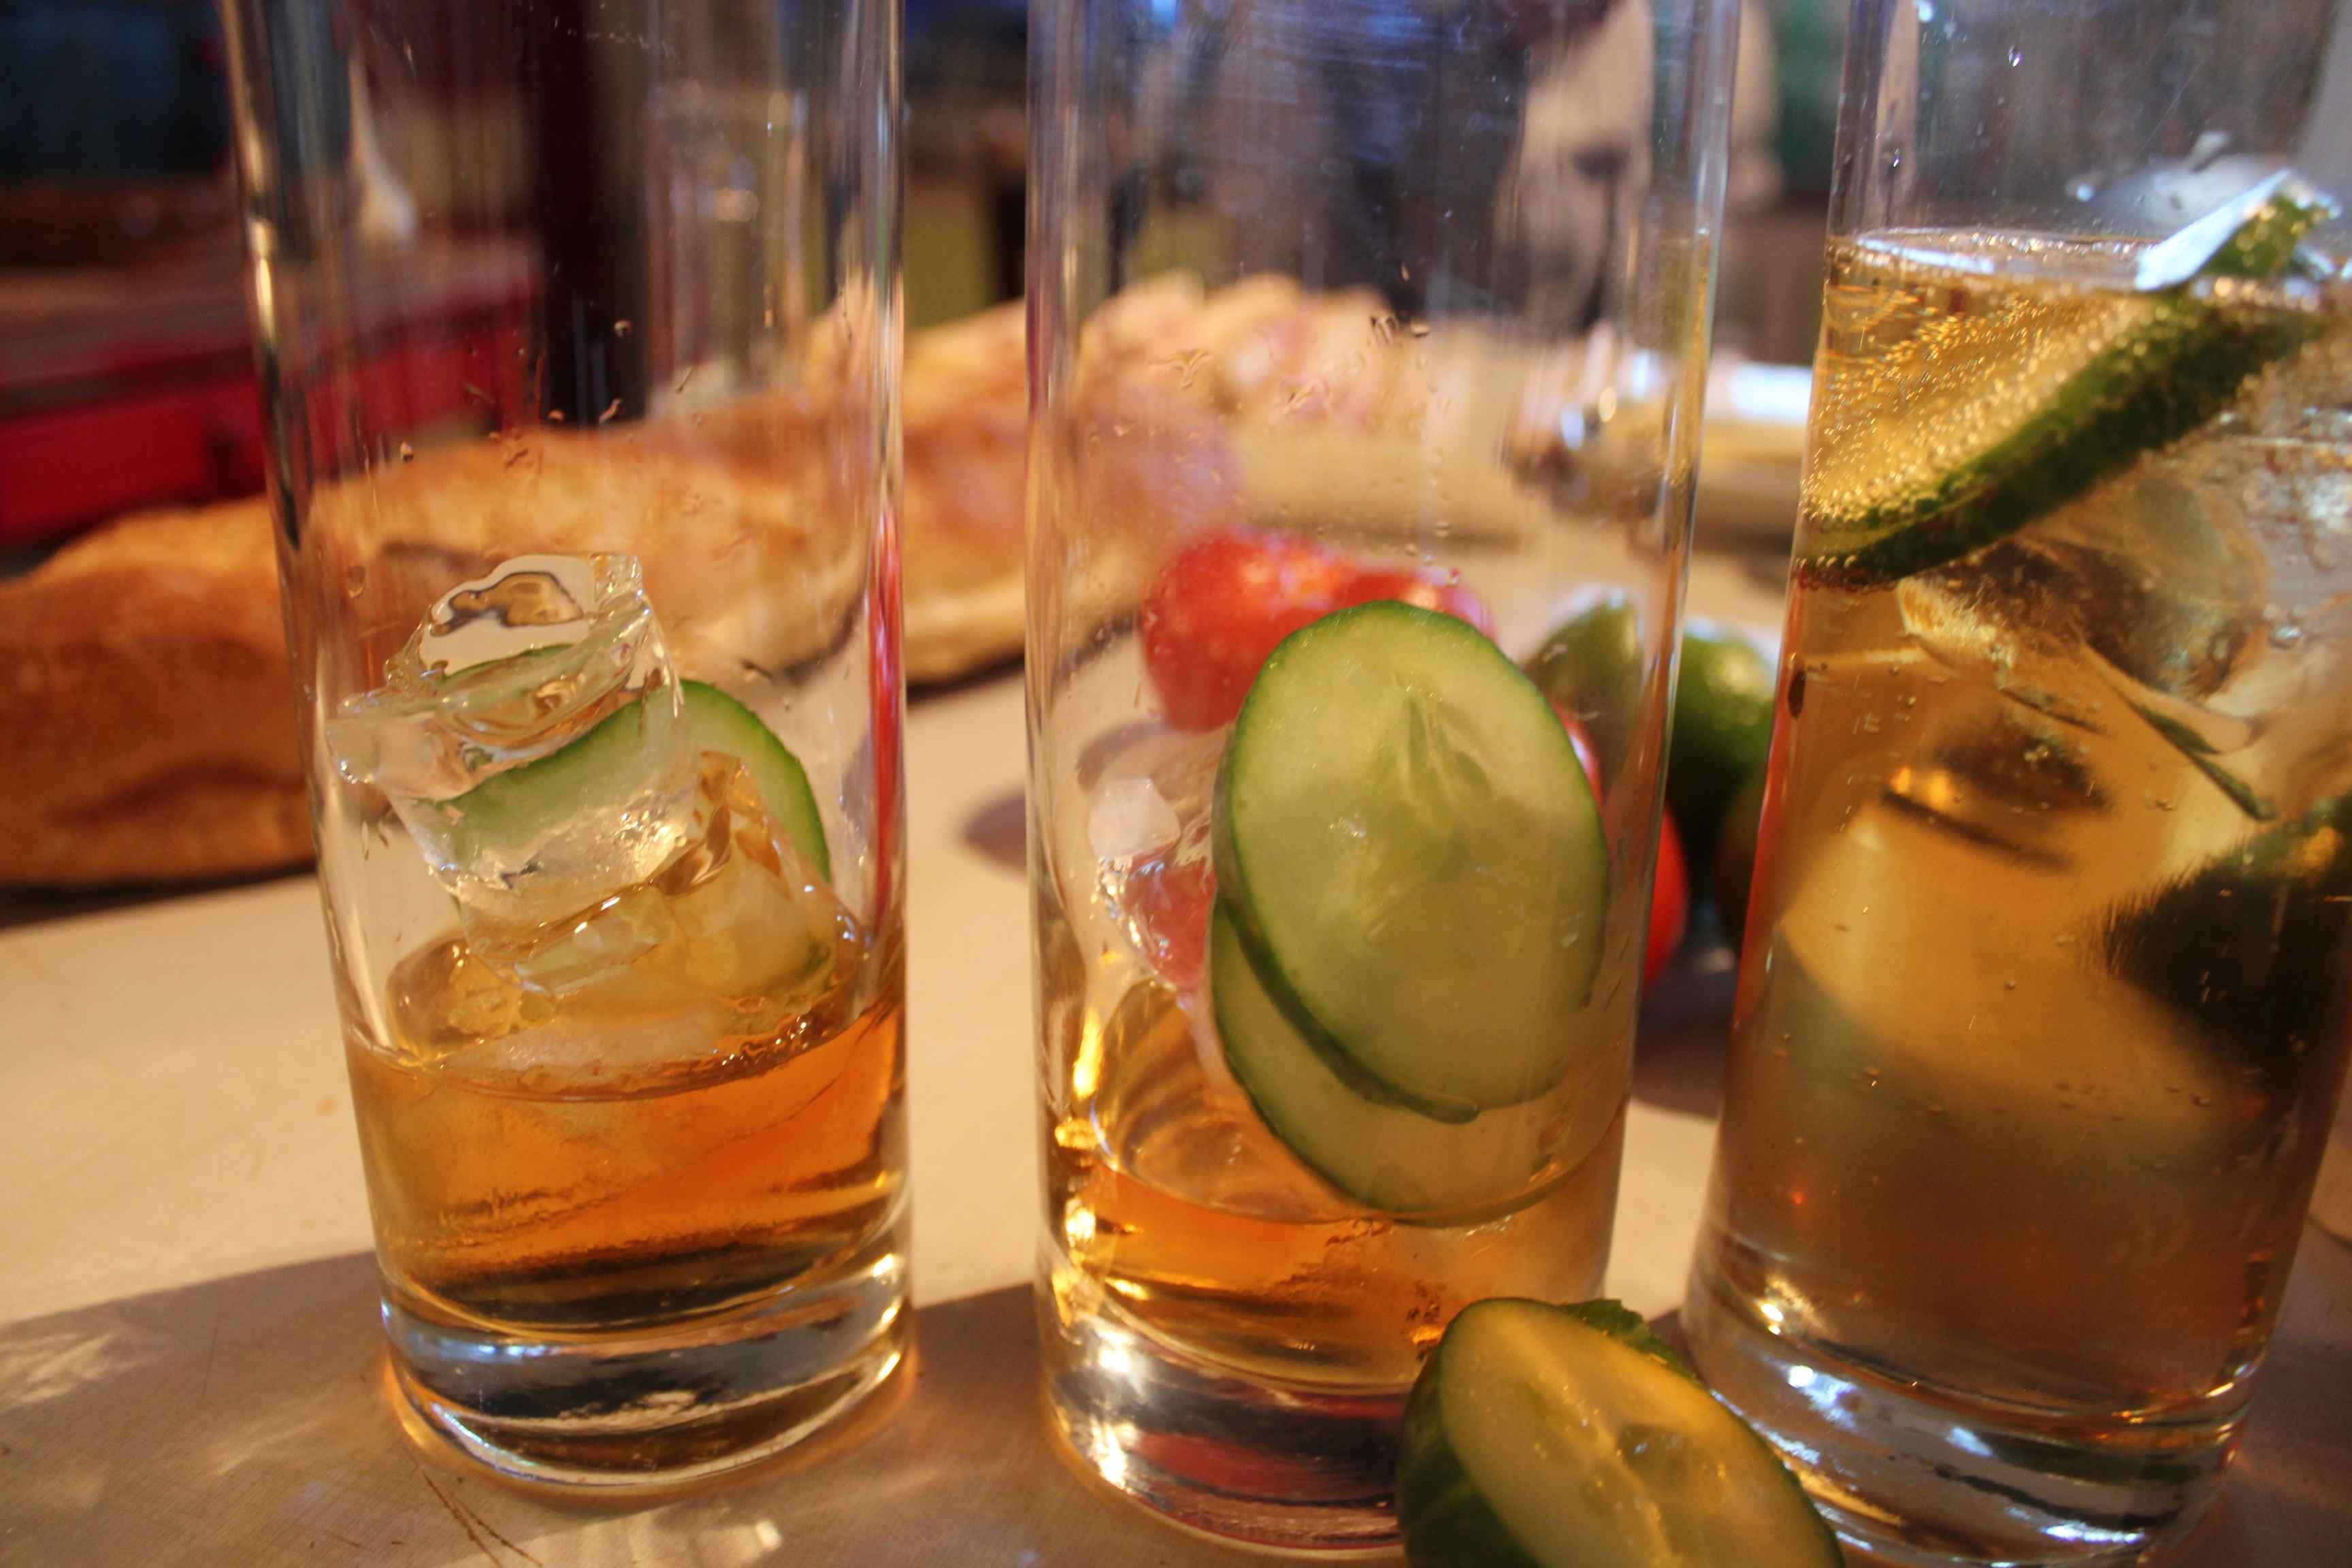 Cucumber in the Cognac drink